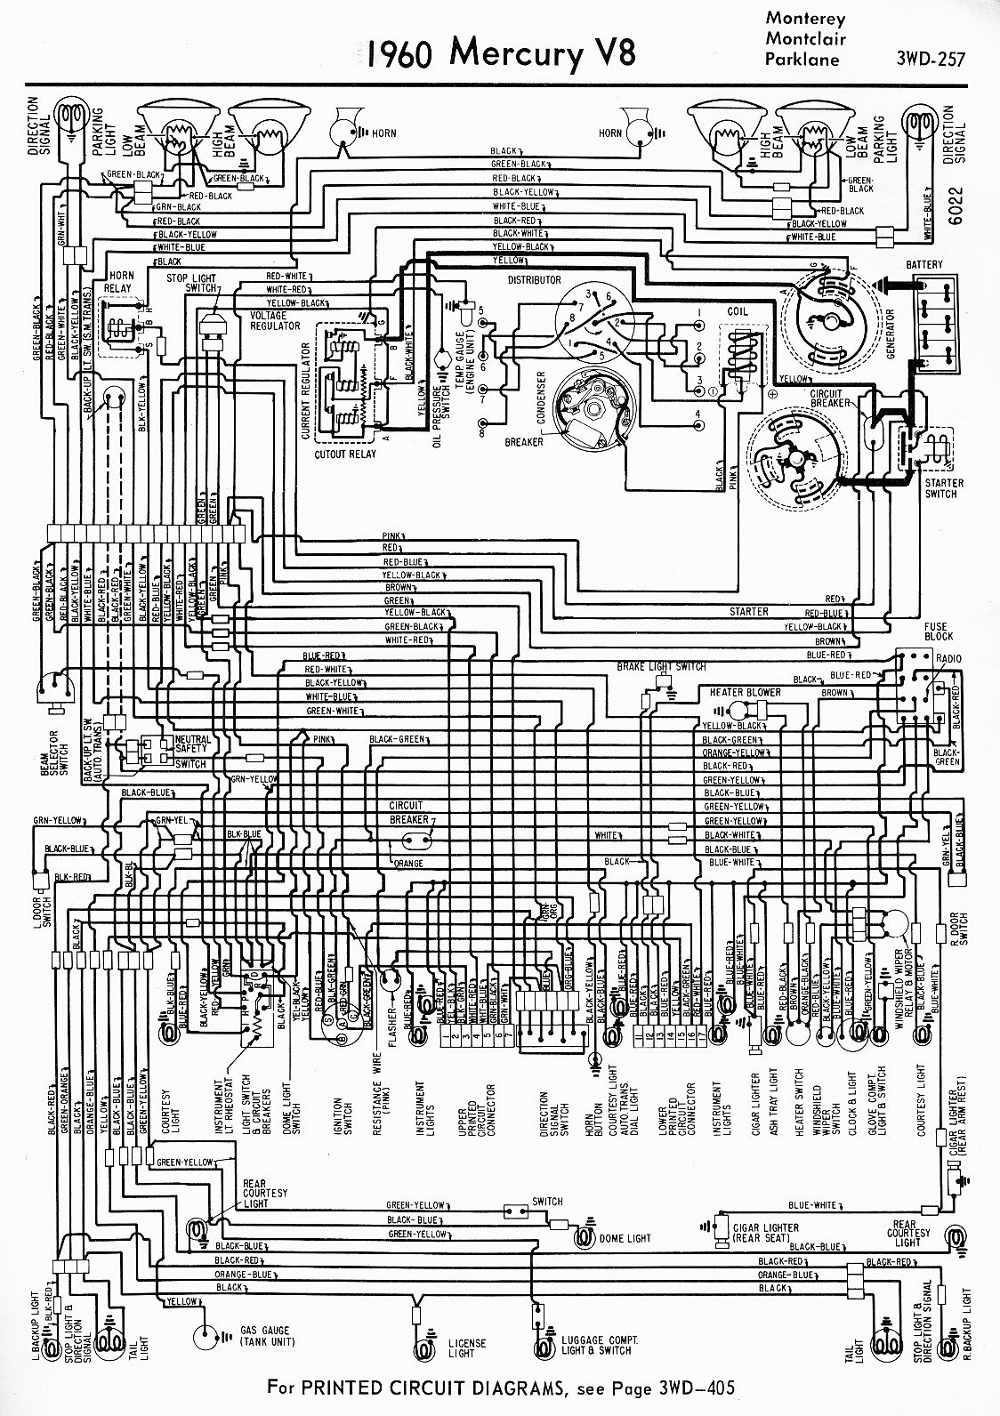 1994 bluebird bus wiring diagram diy enthusiasts wiring diagrams u2022 rh okdrywall co 2000 Bluebird Bus Wiring Diagram Bluebird Bus Schematics